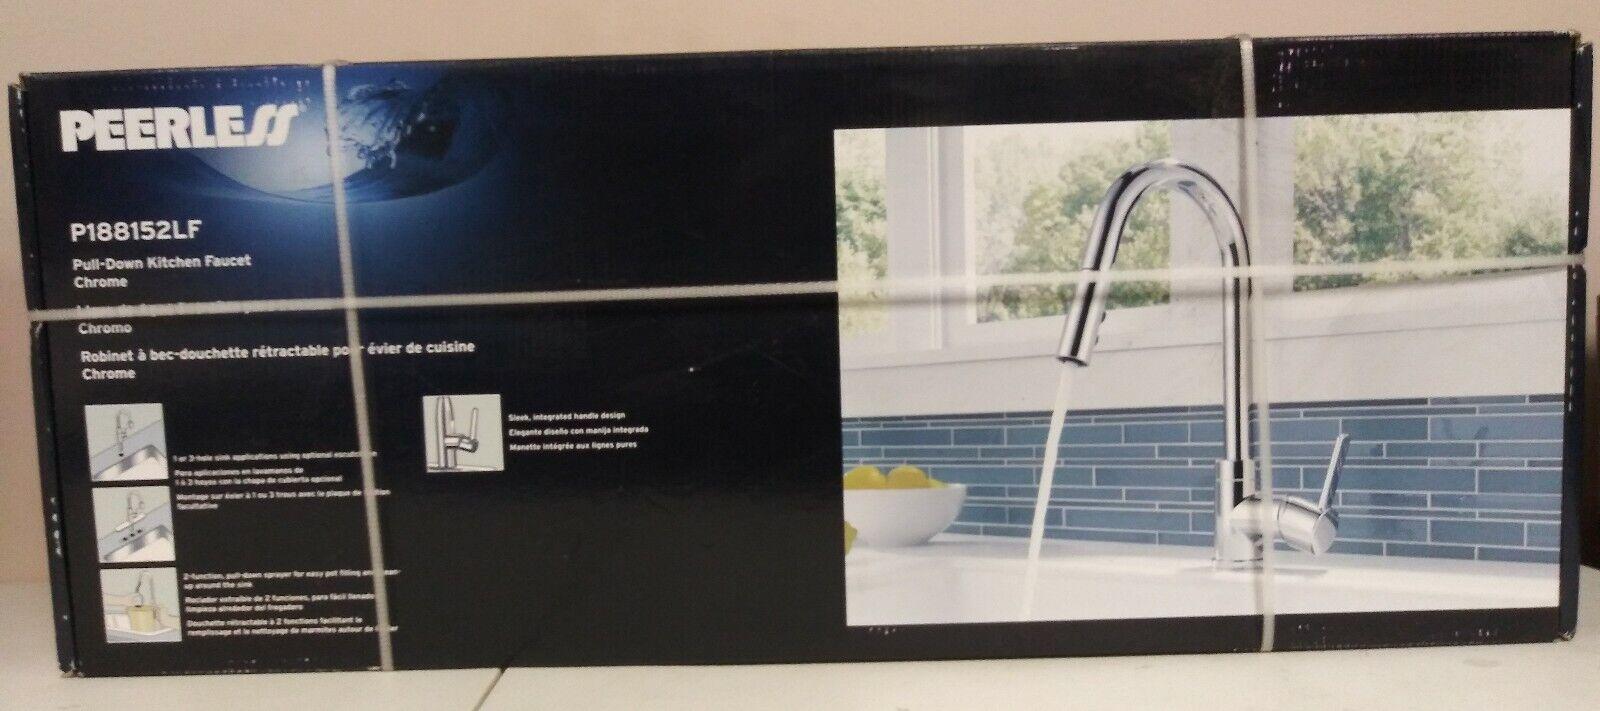 Chrome Delta Faucet P188152lf Peerless Apex Single Handle Pull Down Kitchen Faucet Tools Home Improvement Faucet Parts